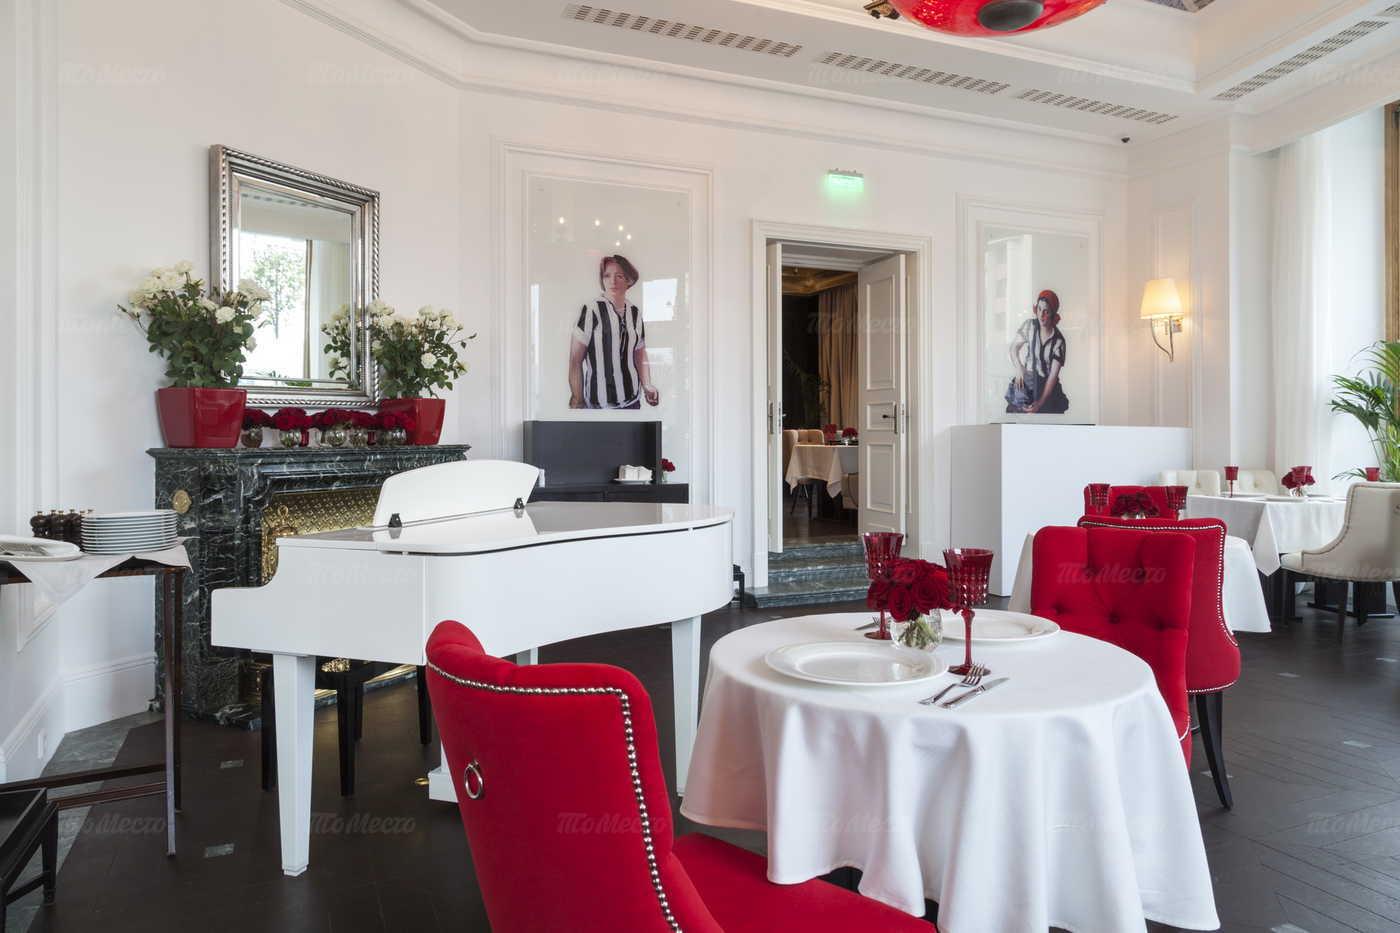 Меню ресторана Гранд-кафе Dr. Живаго (прежн. Композитор) (Dr. Zhivago) на Моховой улице